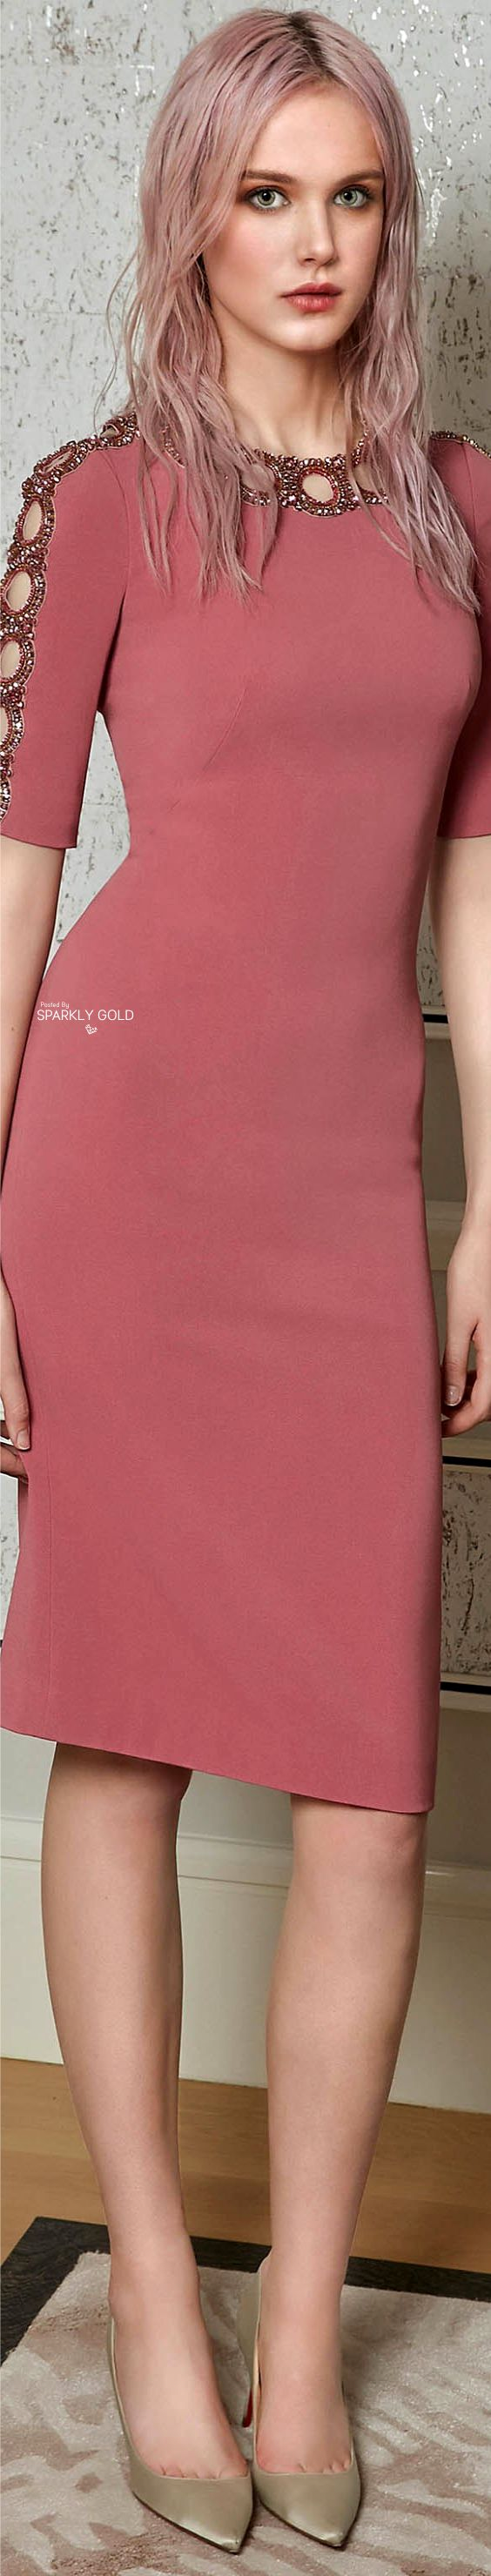 Jenny packham prefall moda u elegancia en vestidos